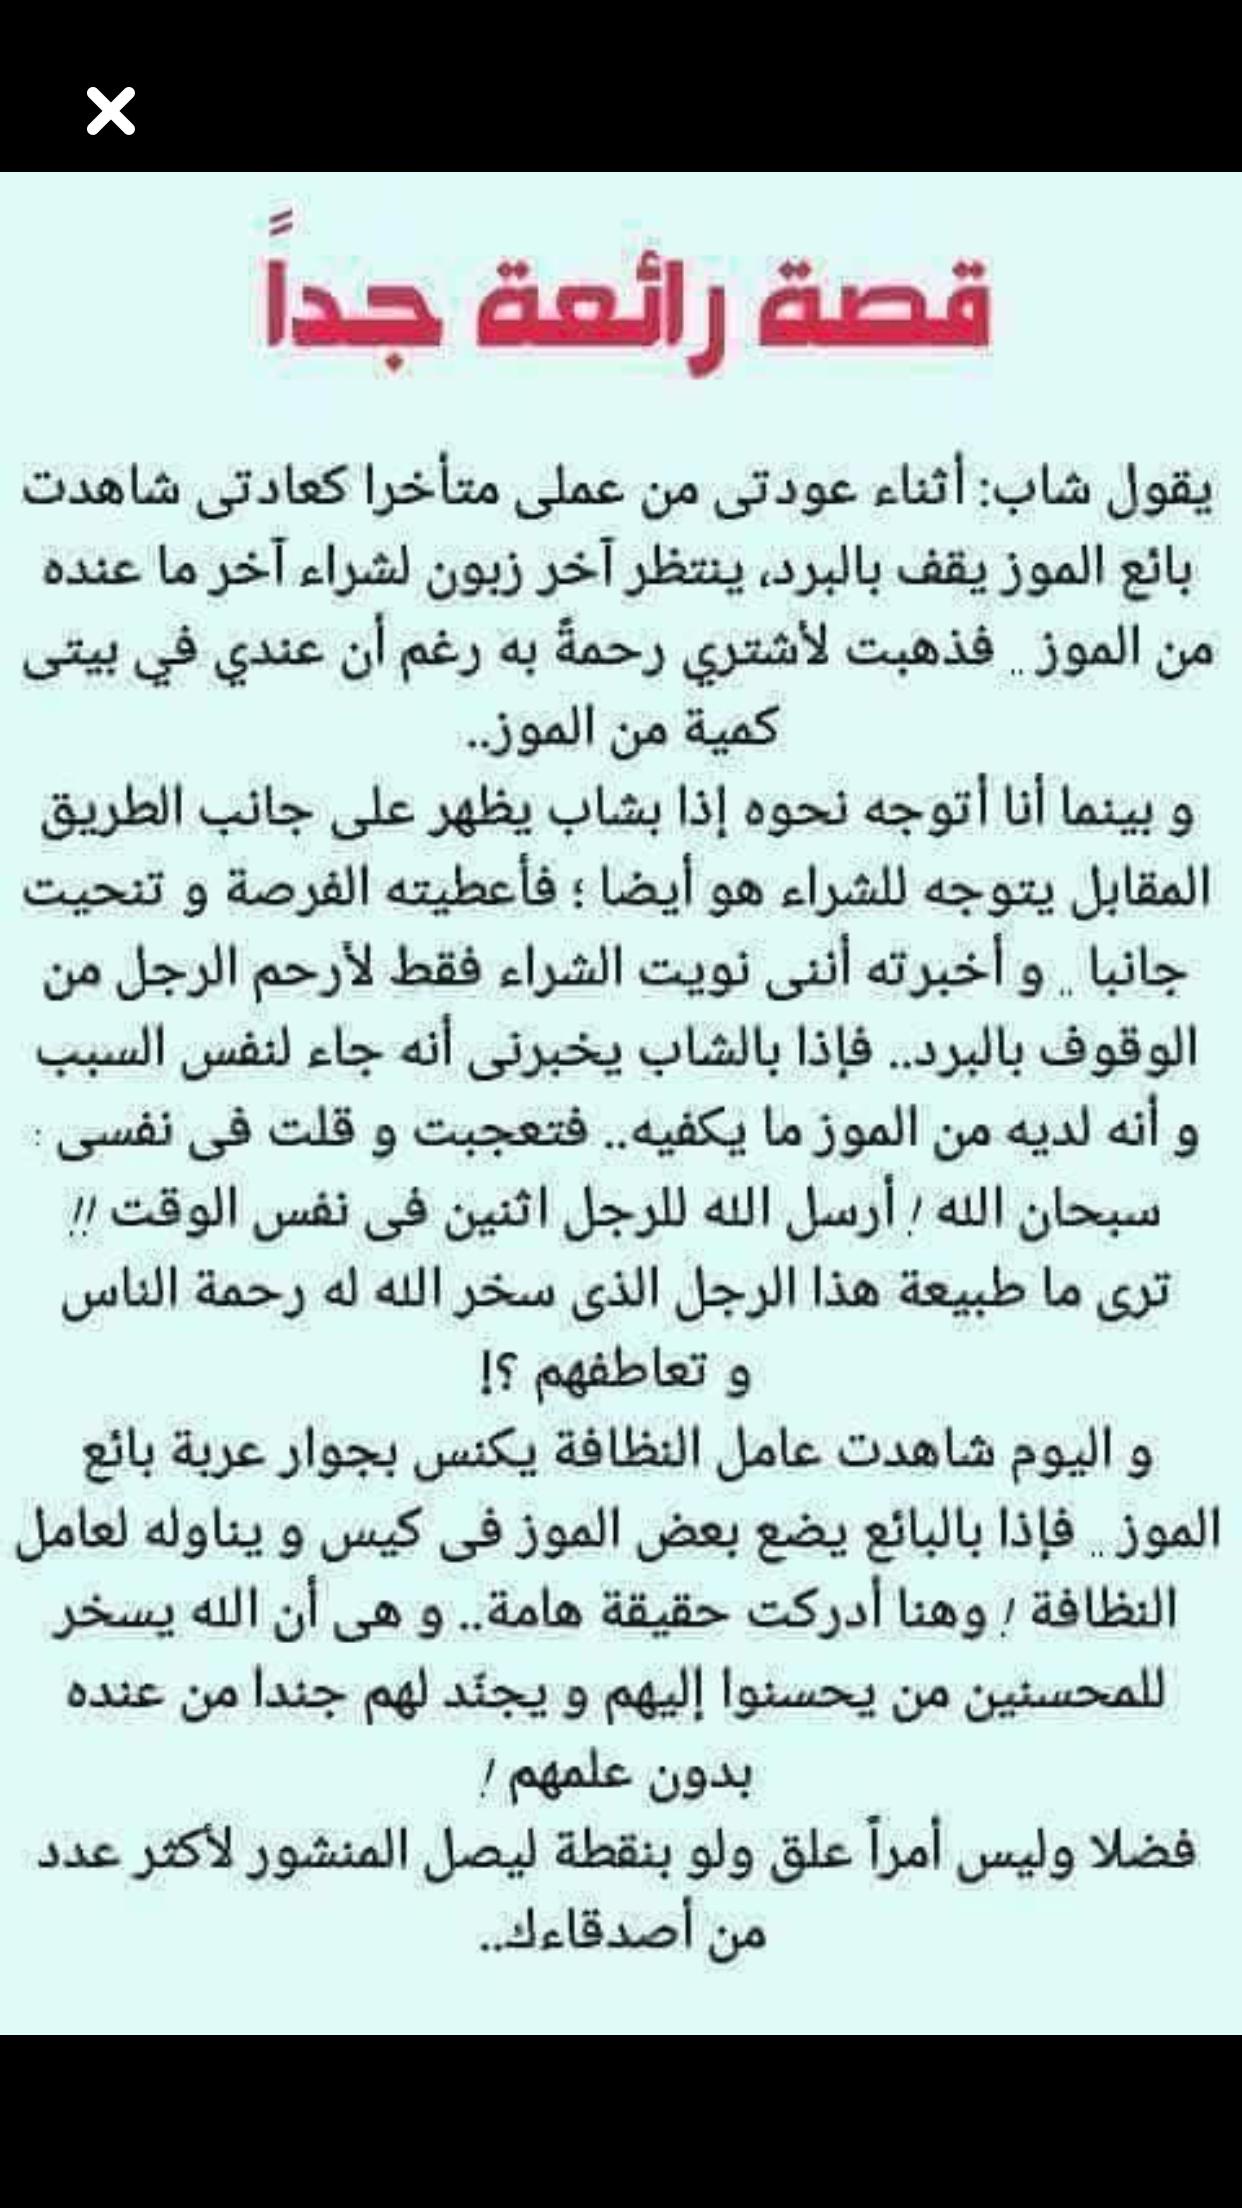 Pin By Alia On اقتباسات Calligraphy Arabic Calligraphy Arabic